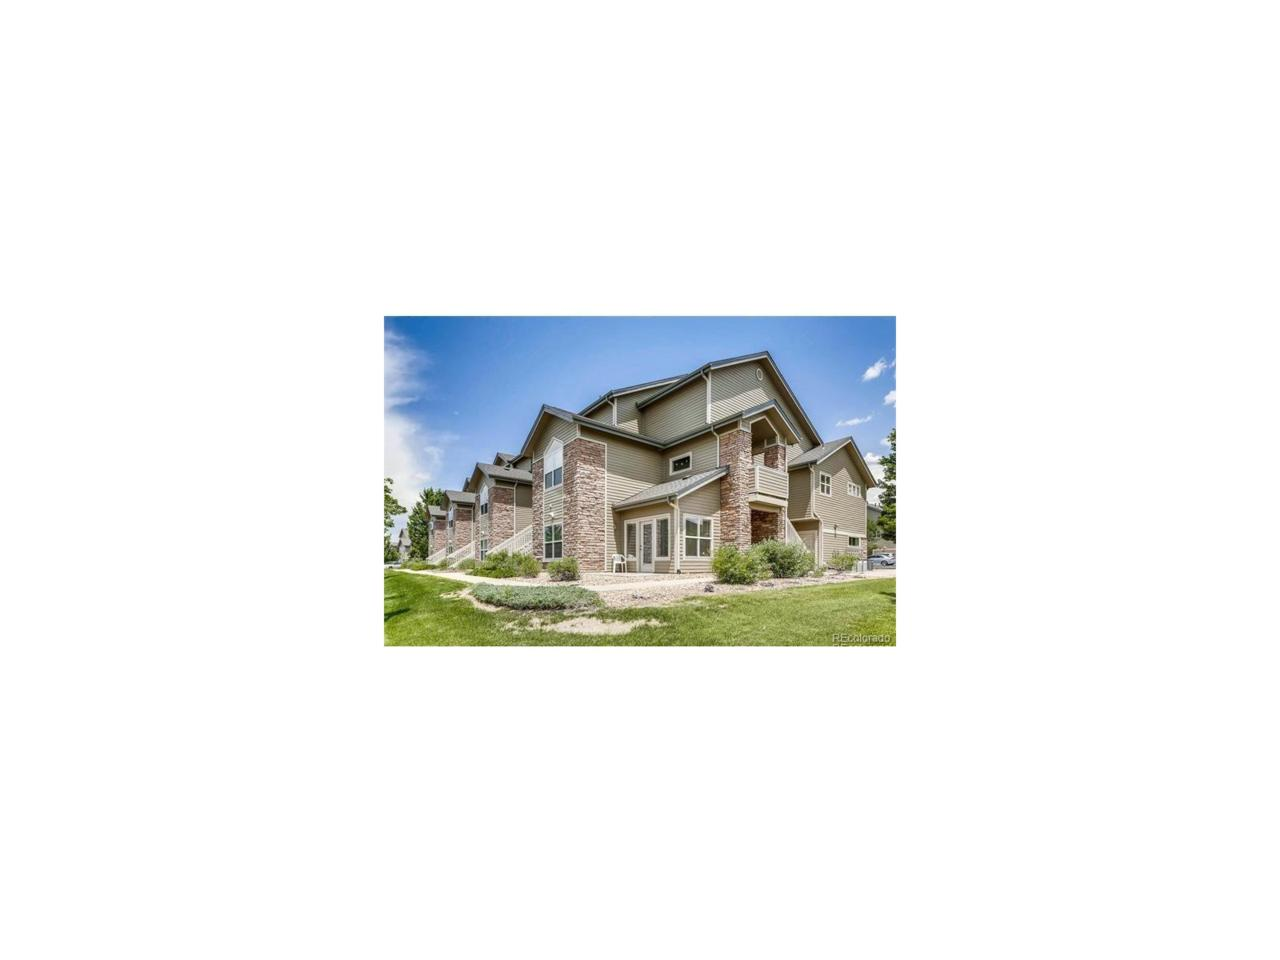 3261 S Waco Court G, Aurora, CO 80013 (MLS #2667701) :: 8z Real Estate